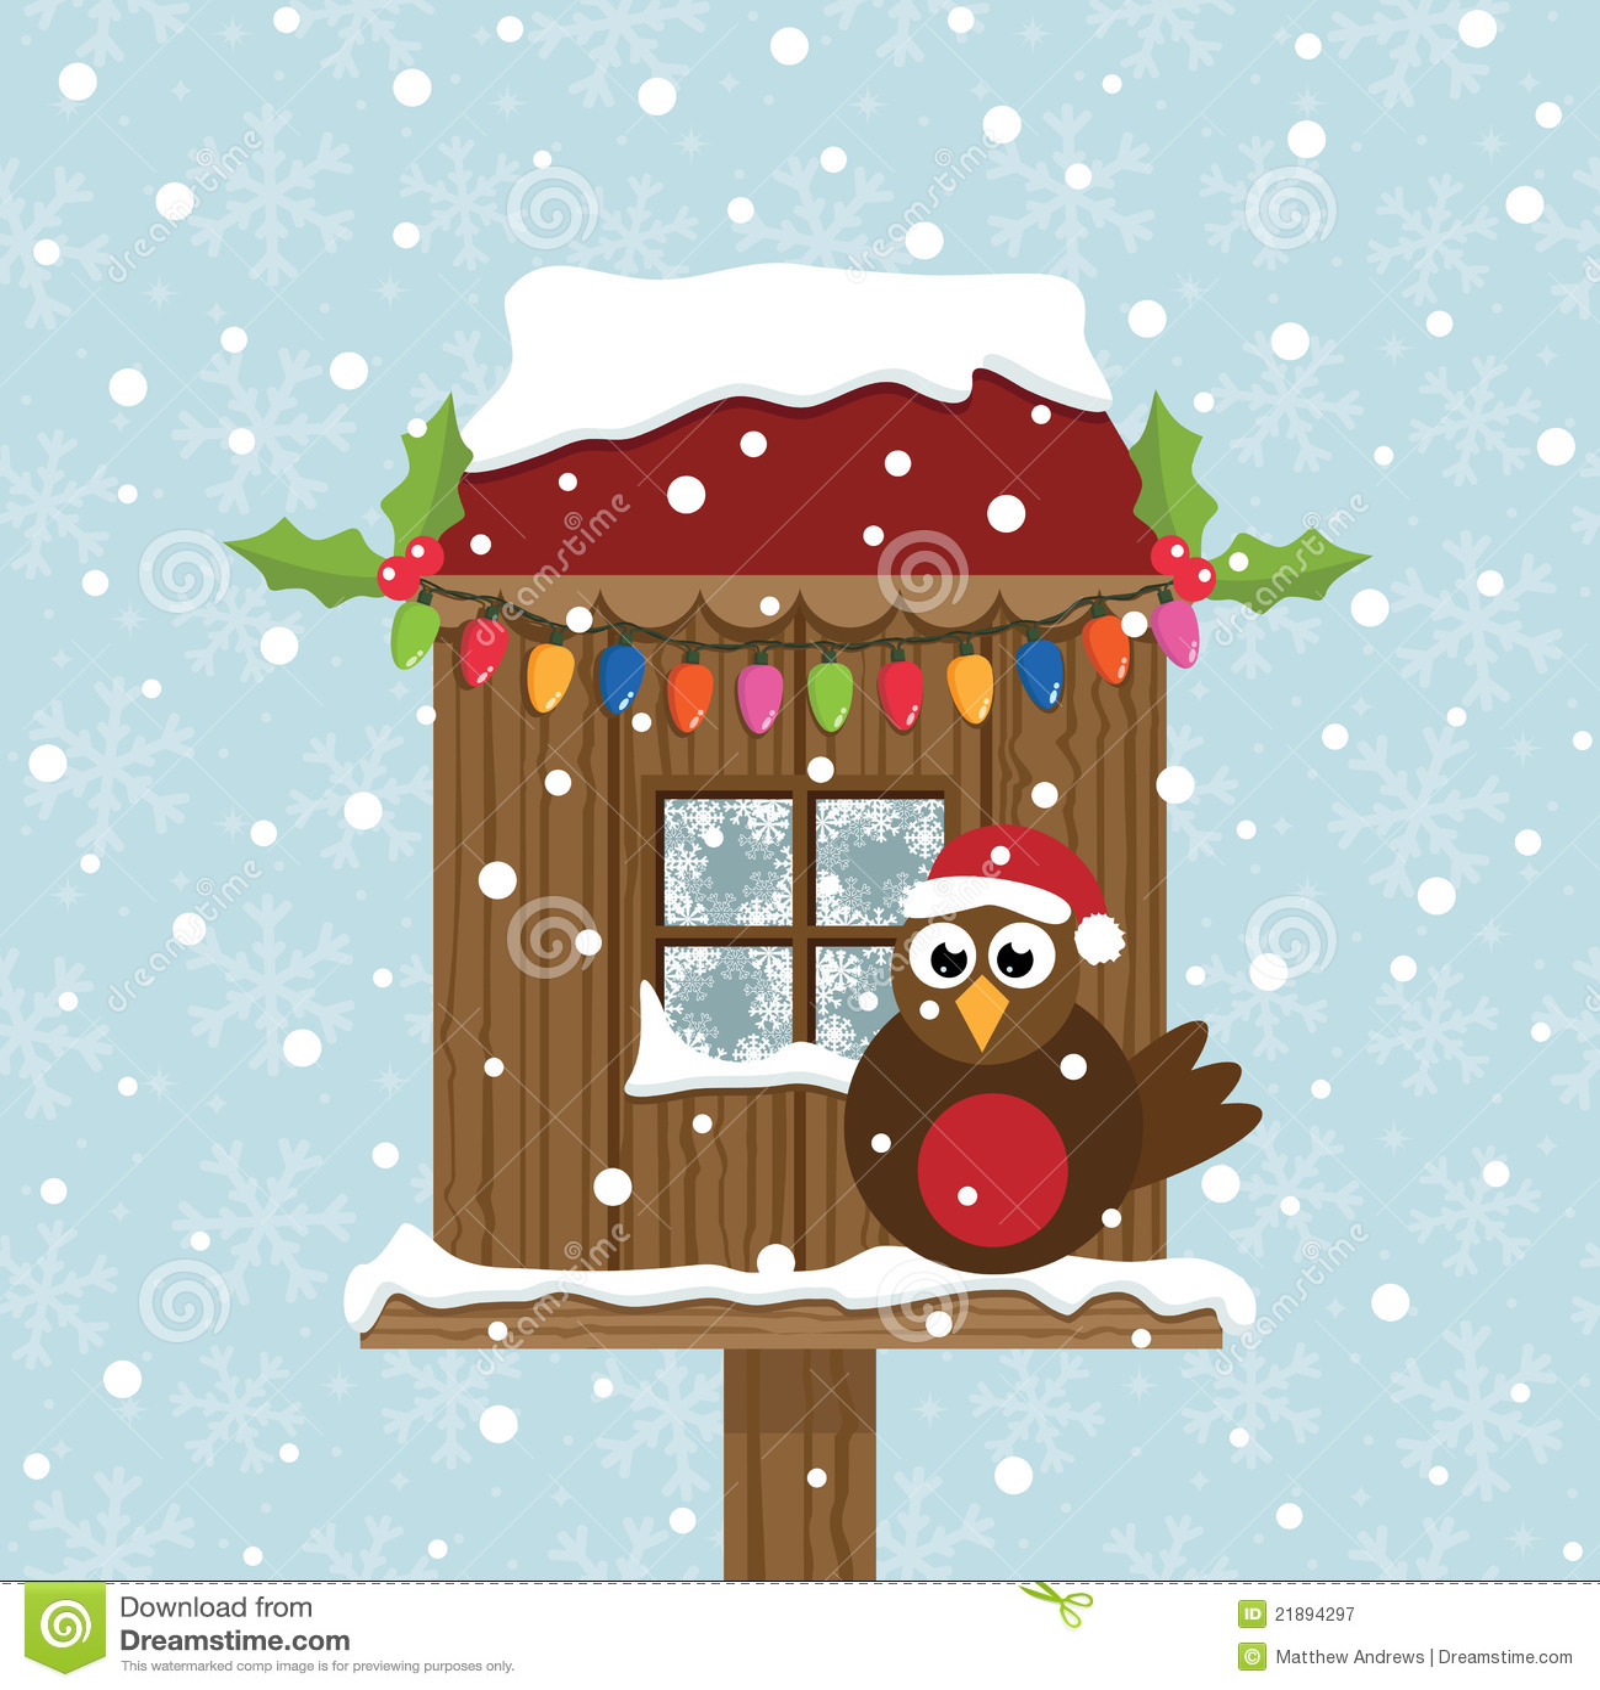 Christmas Birdhouses.Christmas Birdhouse Stock Vector Illustration Of Card